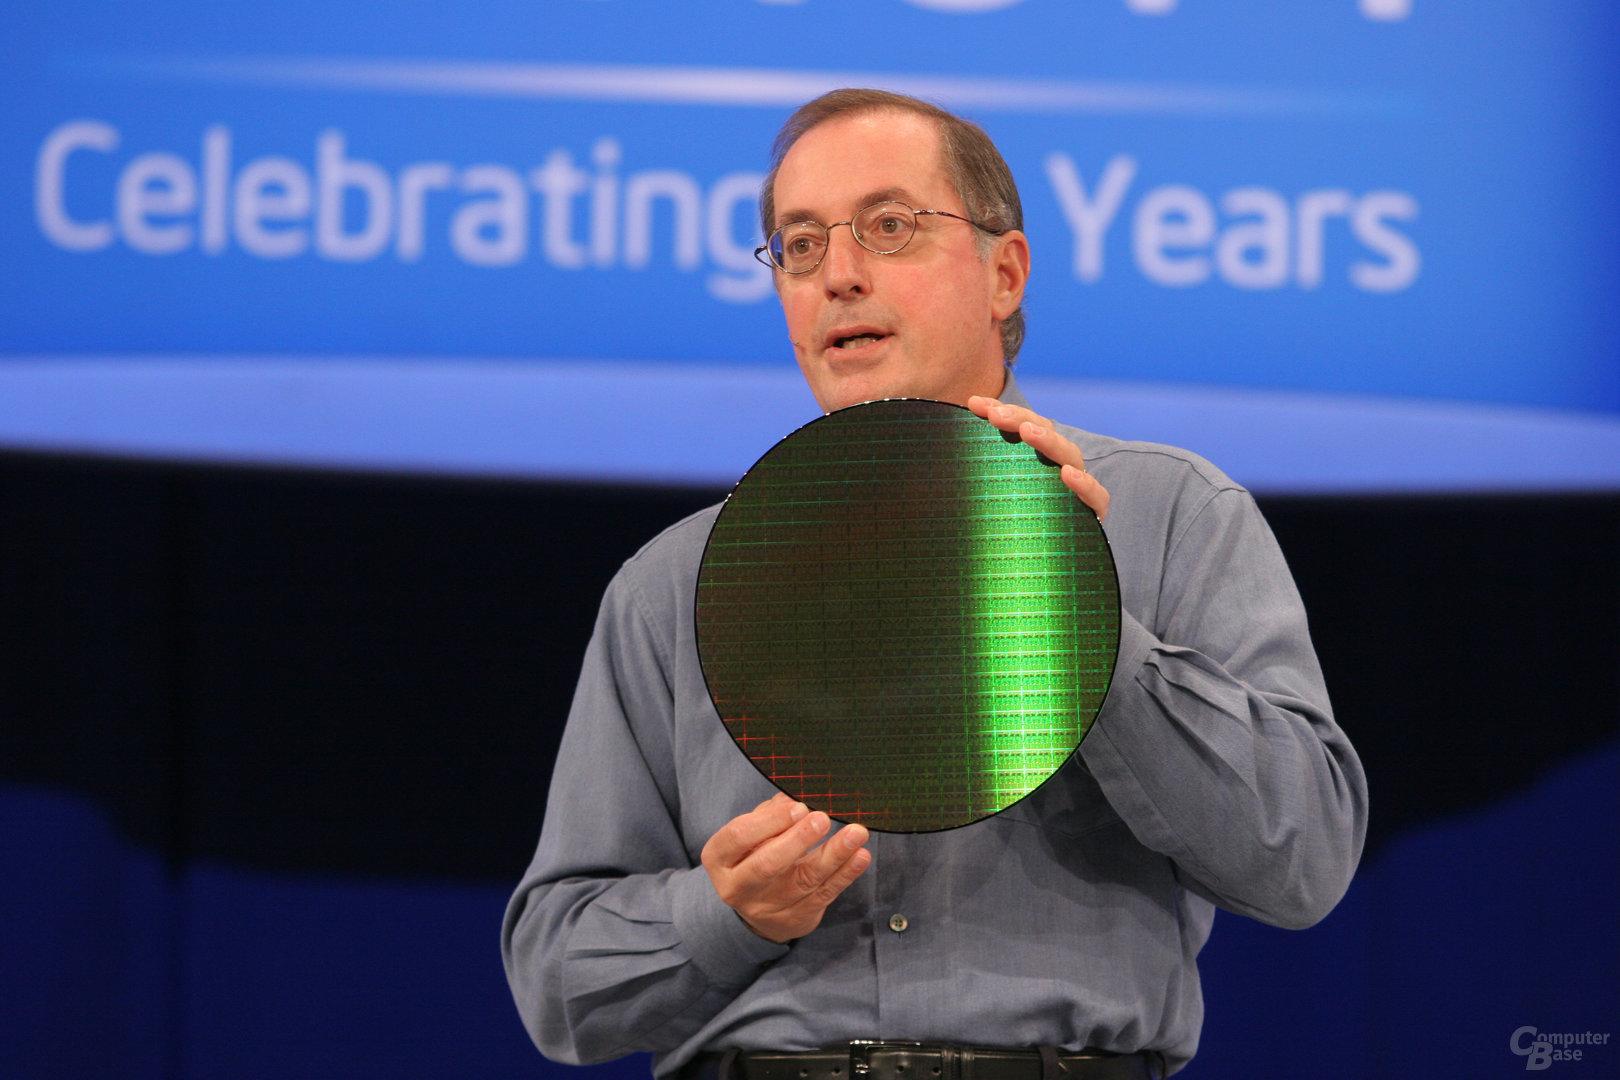 Paul Otellini präsentiert einen Nehalem Quad-Core Wafer (IDF Fall 2007)